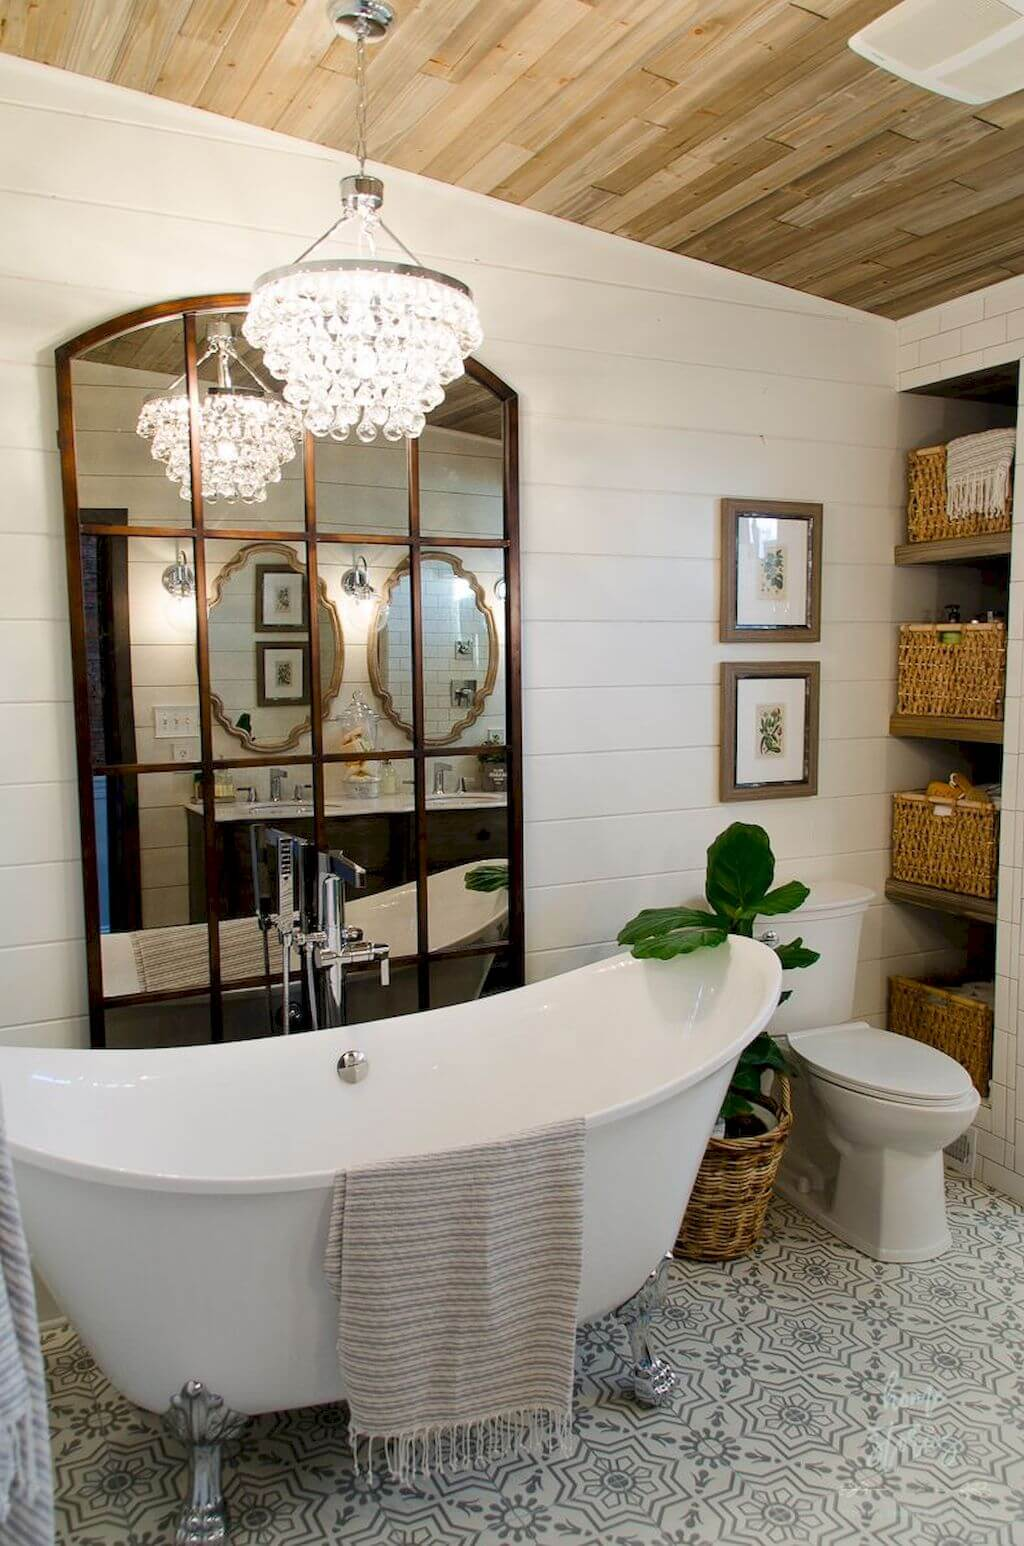 Oversized Mirror by the Bathtub